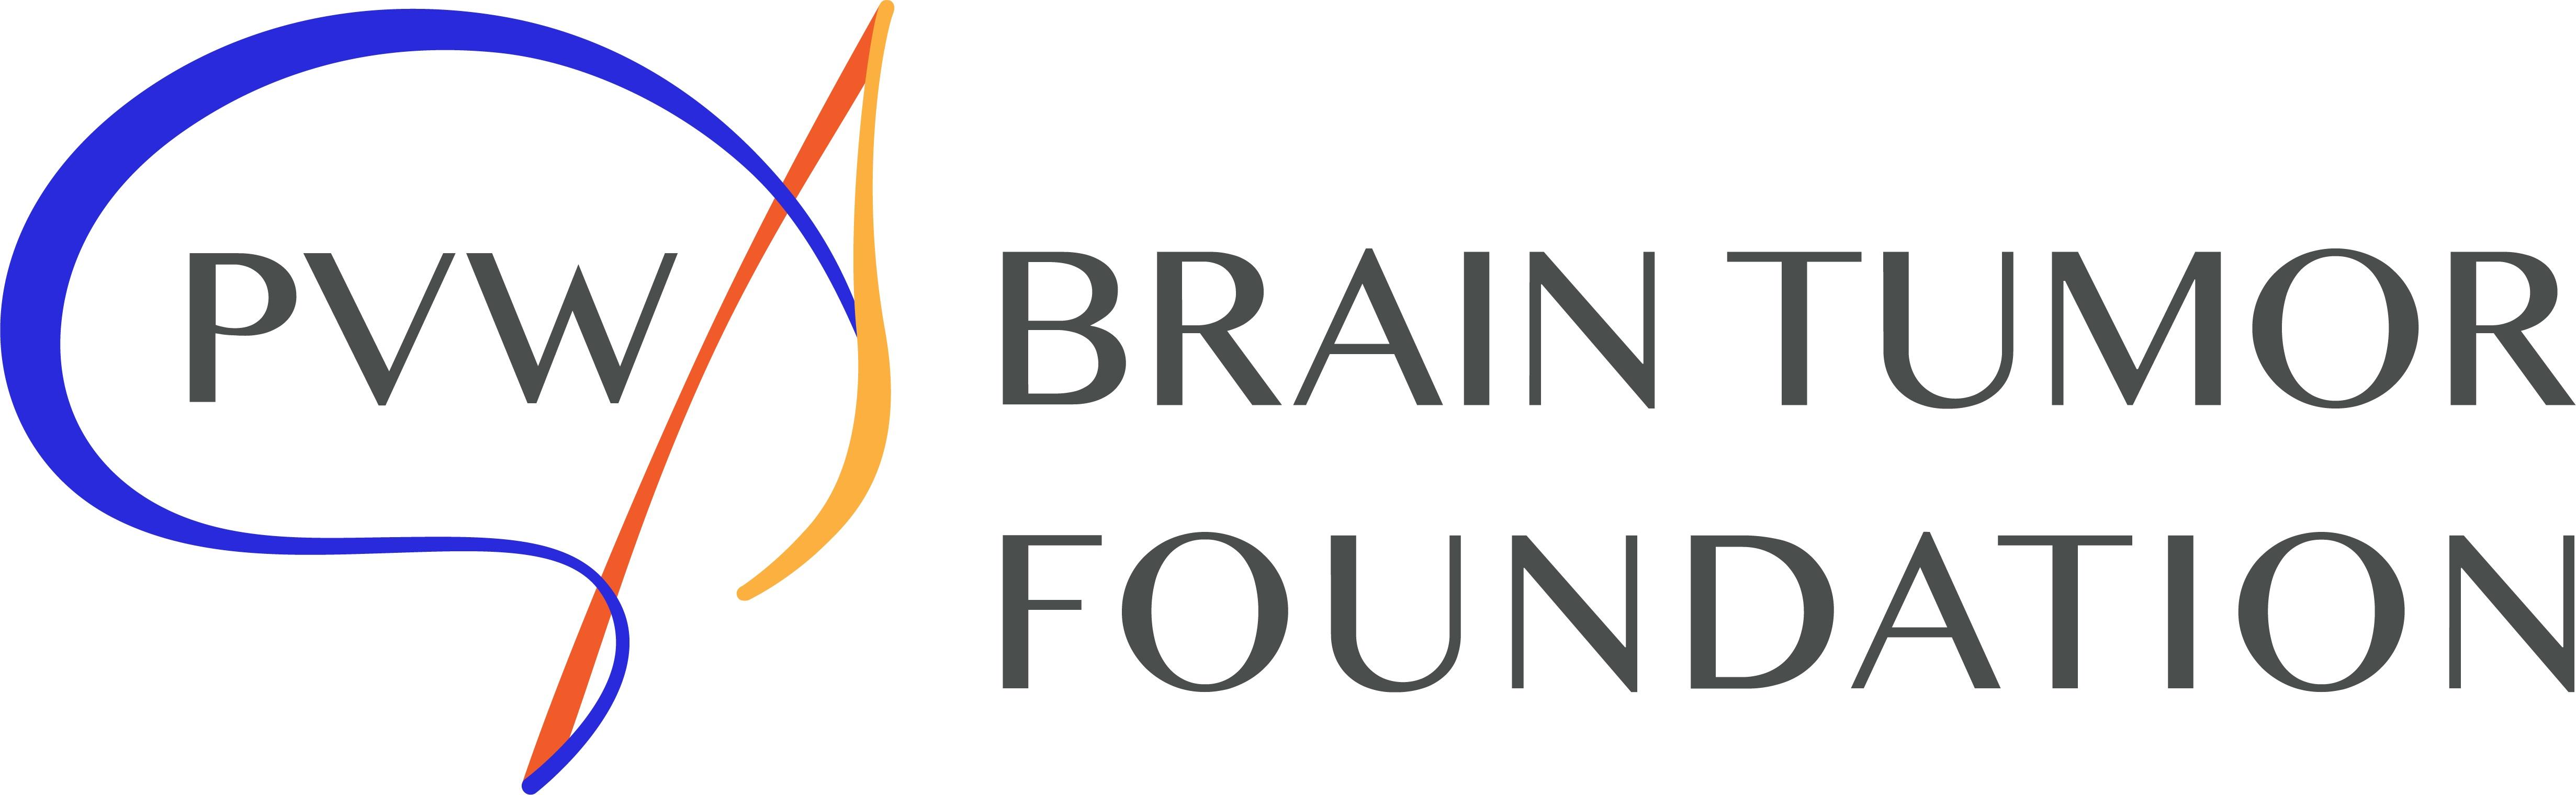 PVW Brain Tumor Foundation